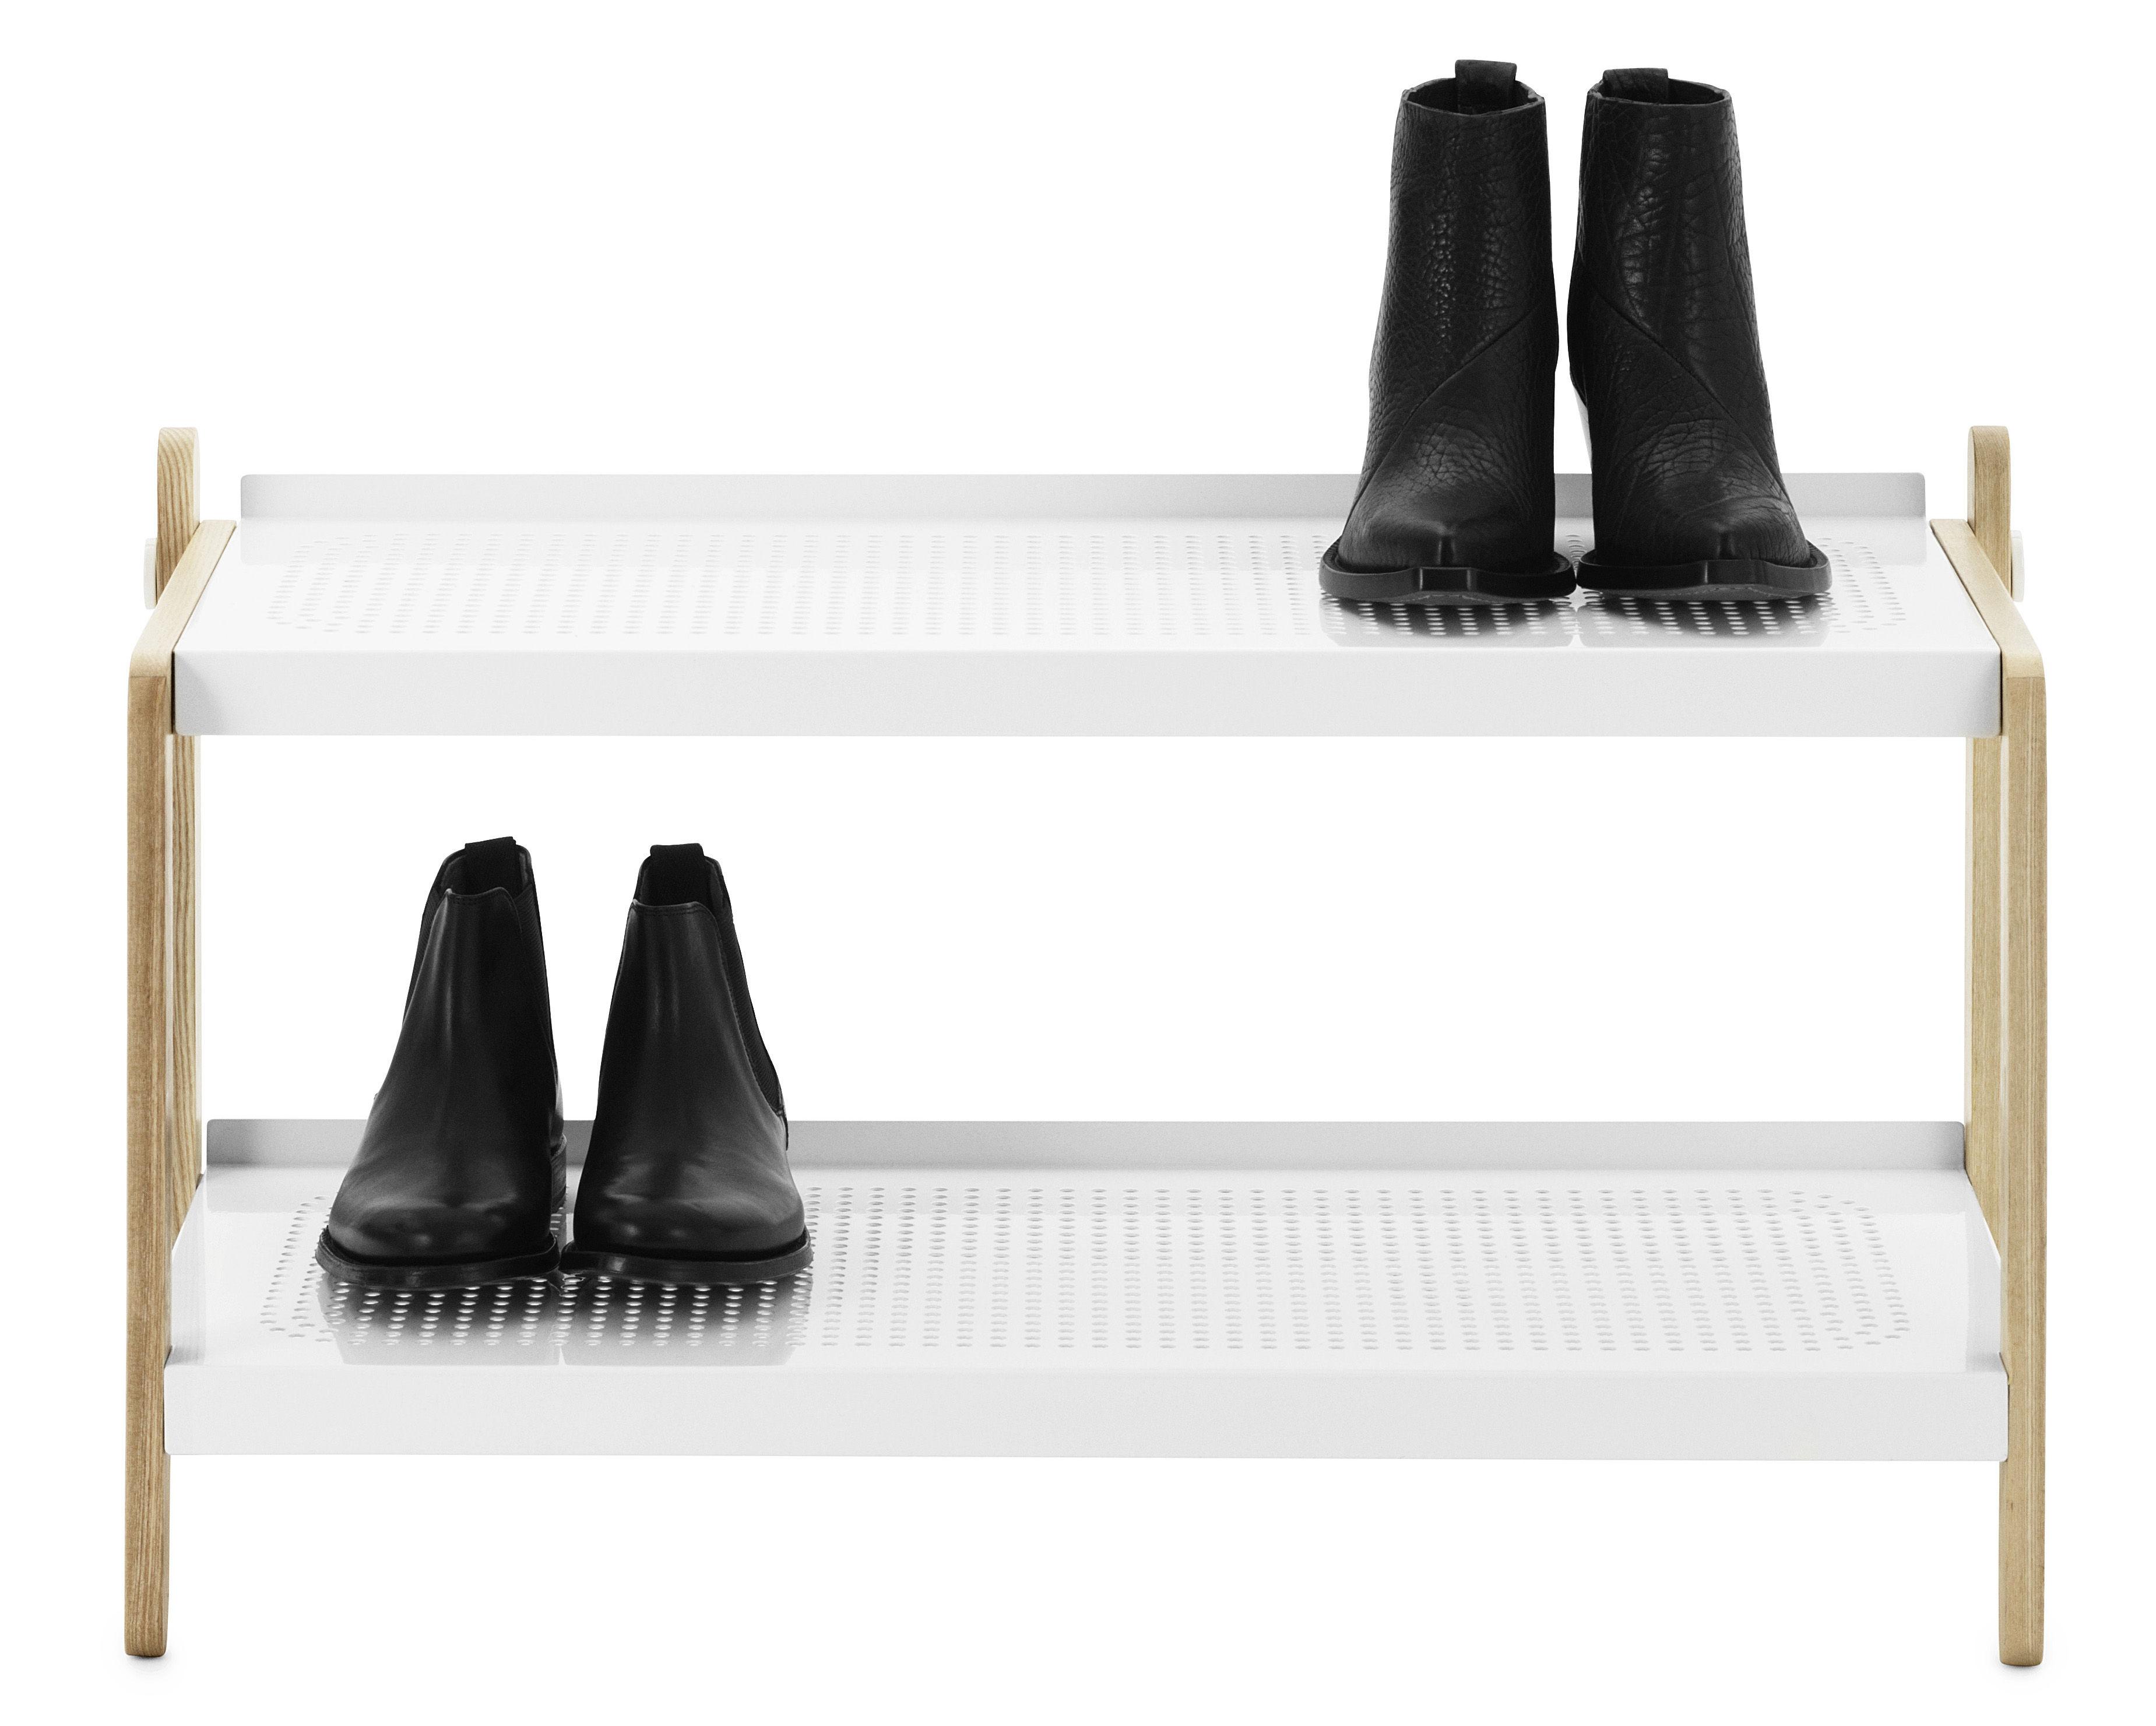 17adfe6a9b26 Shoe rack Sko by Normann Copenhagen - White - L 76 x h 42